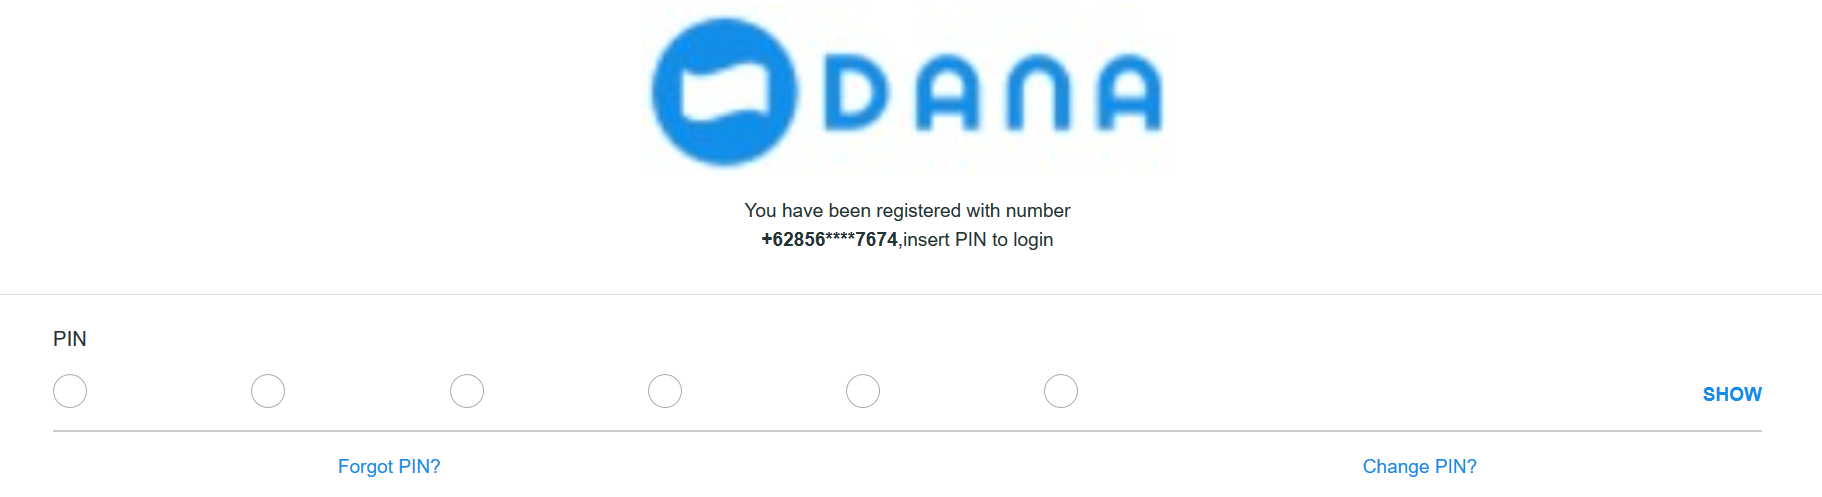 1 SMS 6 digit code